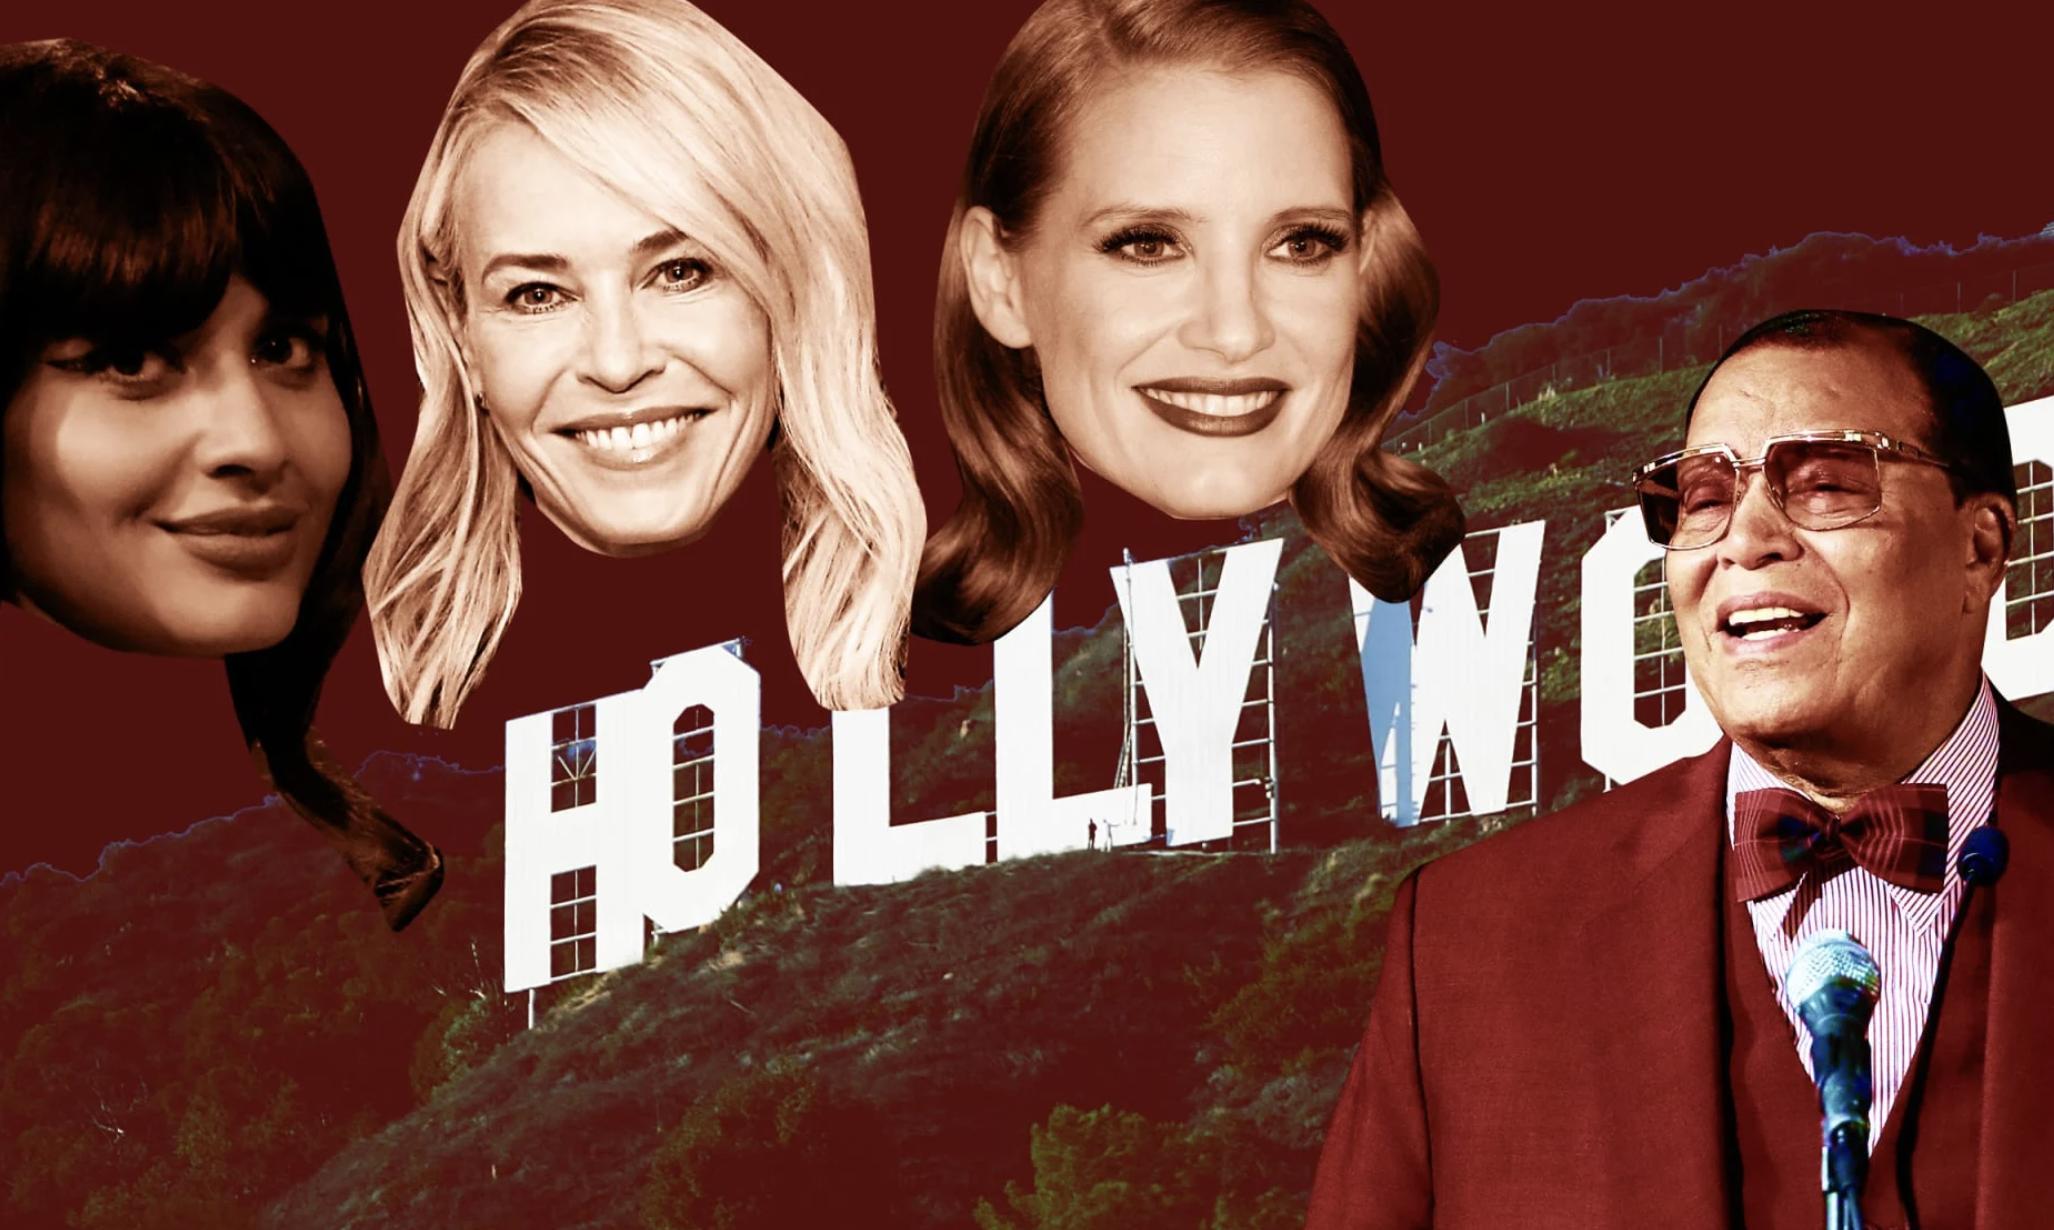 Hollywood Celebs Are Praising An Anti-Semitic Hatemonger